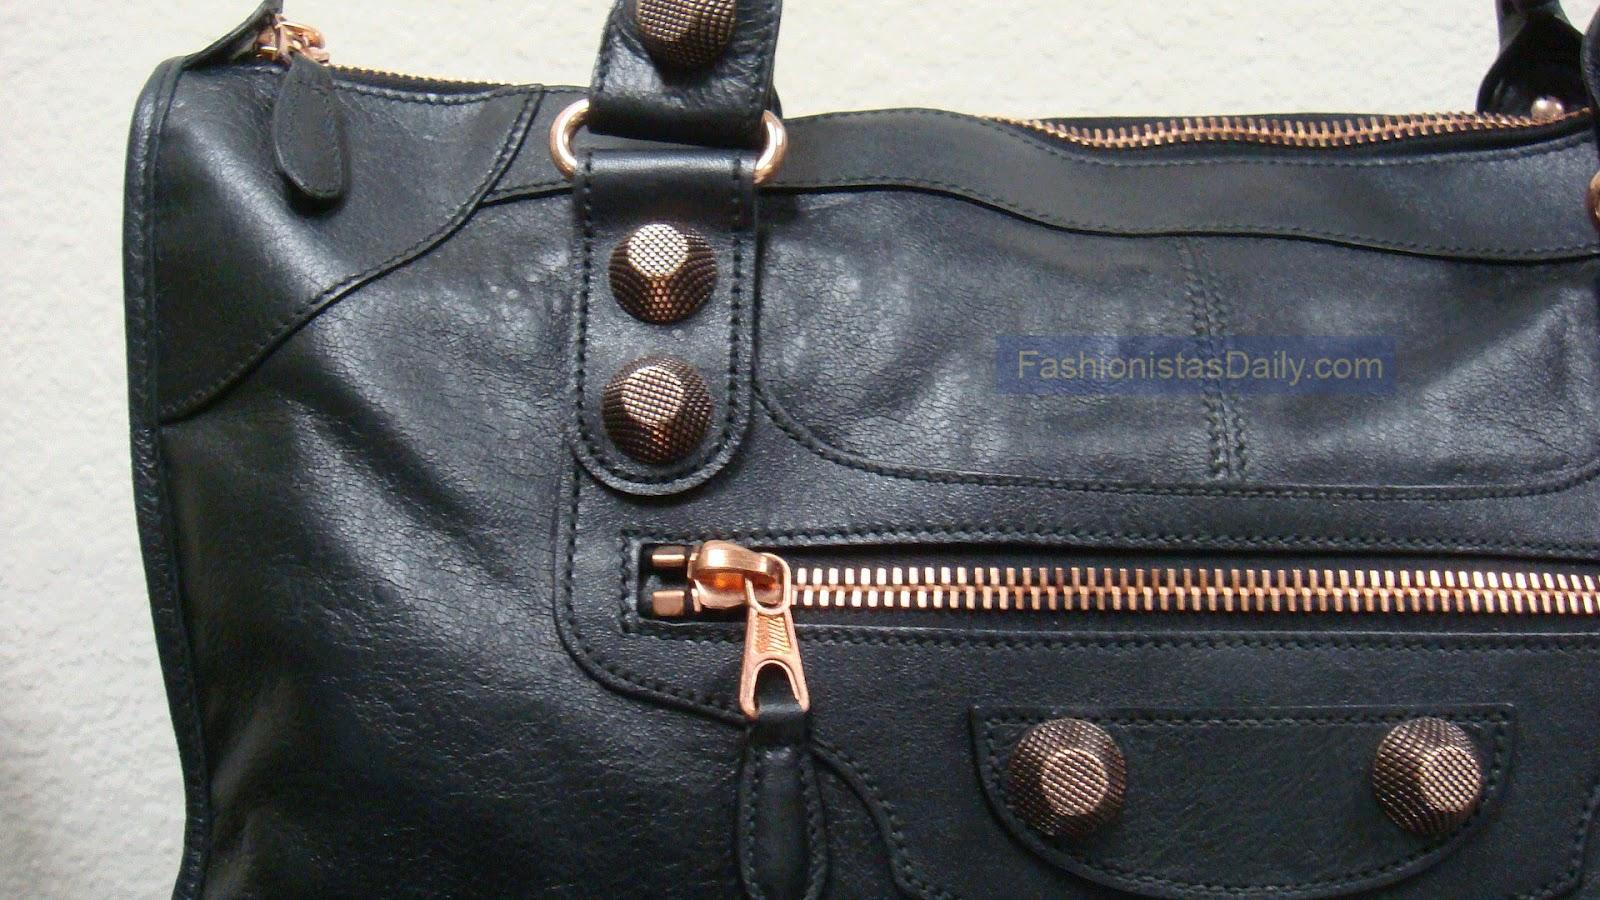 Balenciaga Bag Rose Gold Hardware | The Art